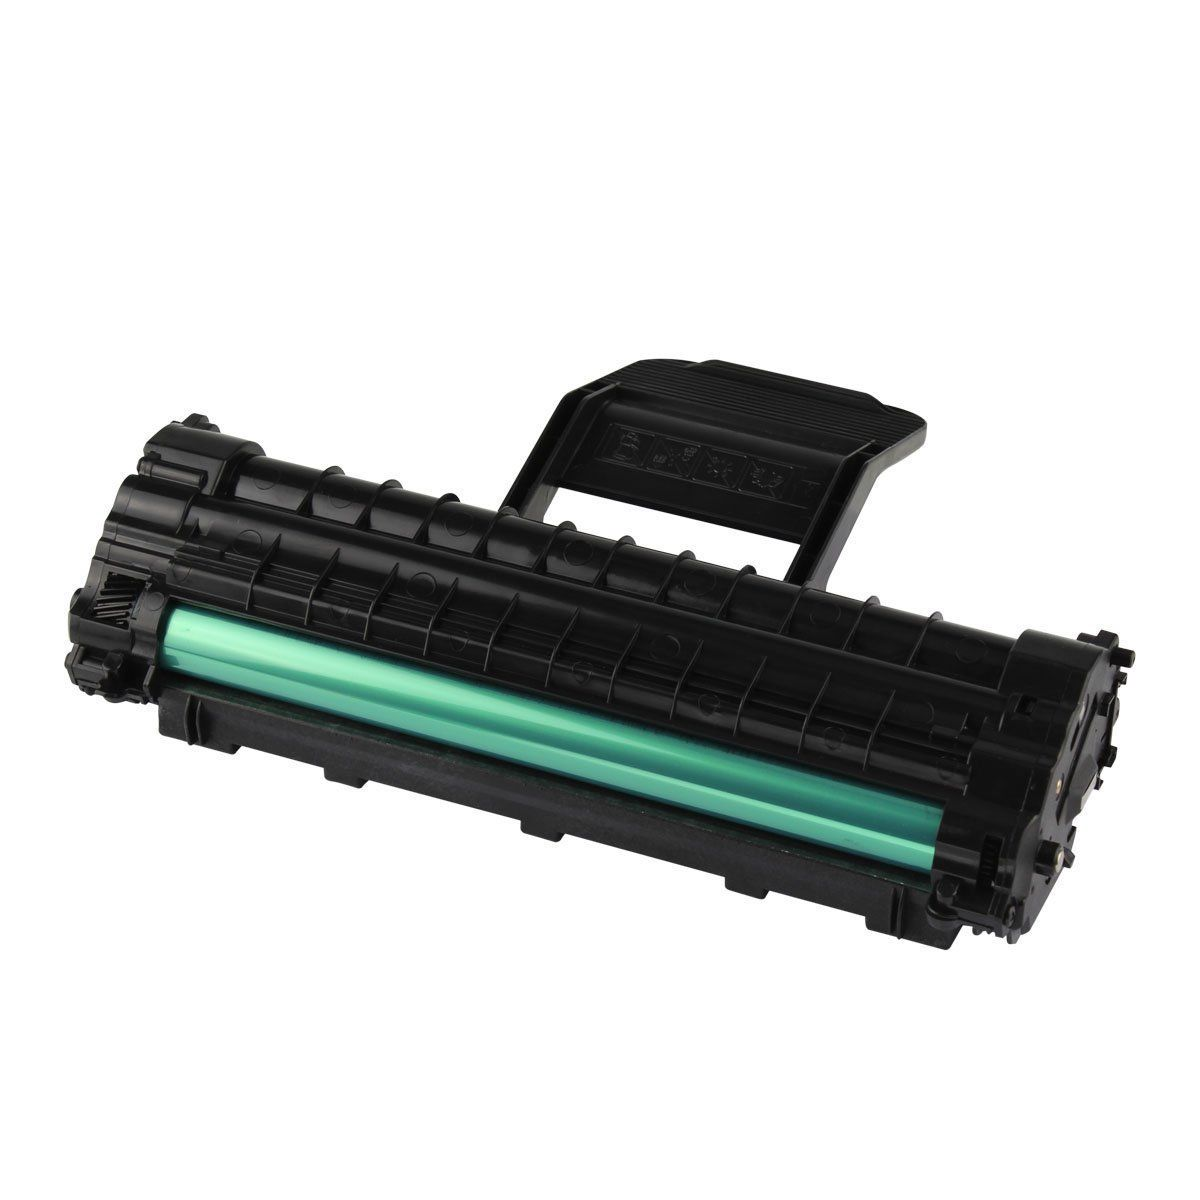 Ikon Samsung MLT-D108L Black White Toner Ink Cartridge